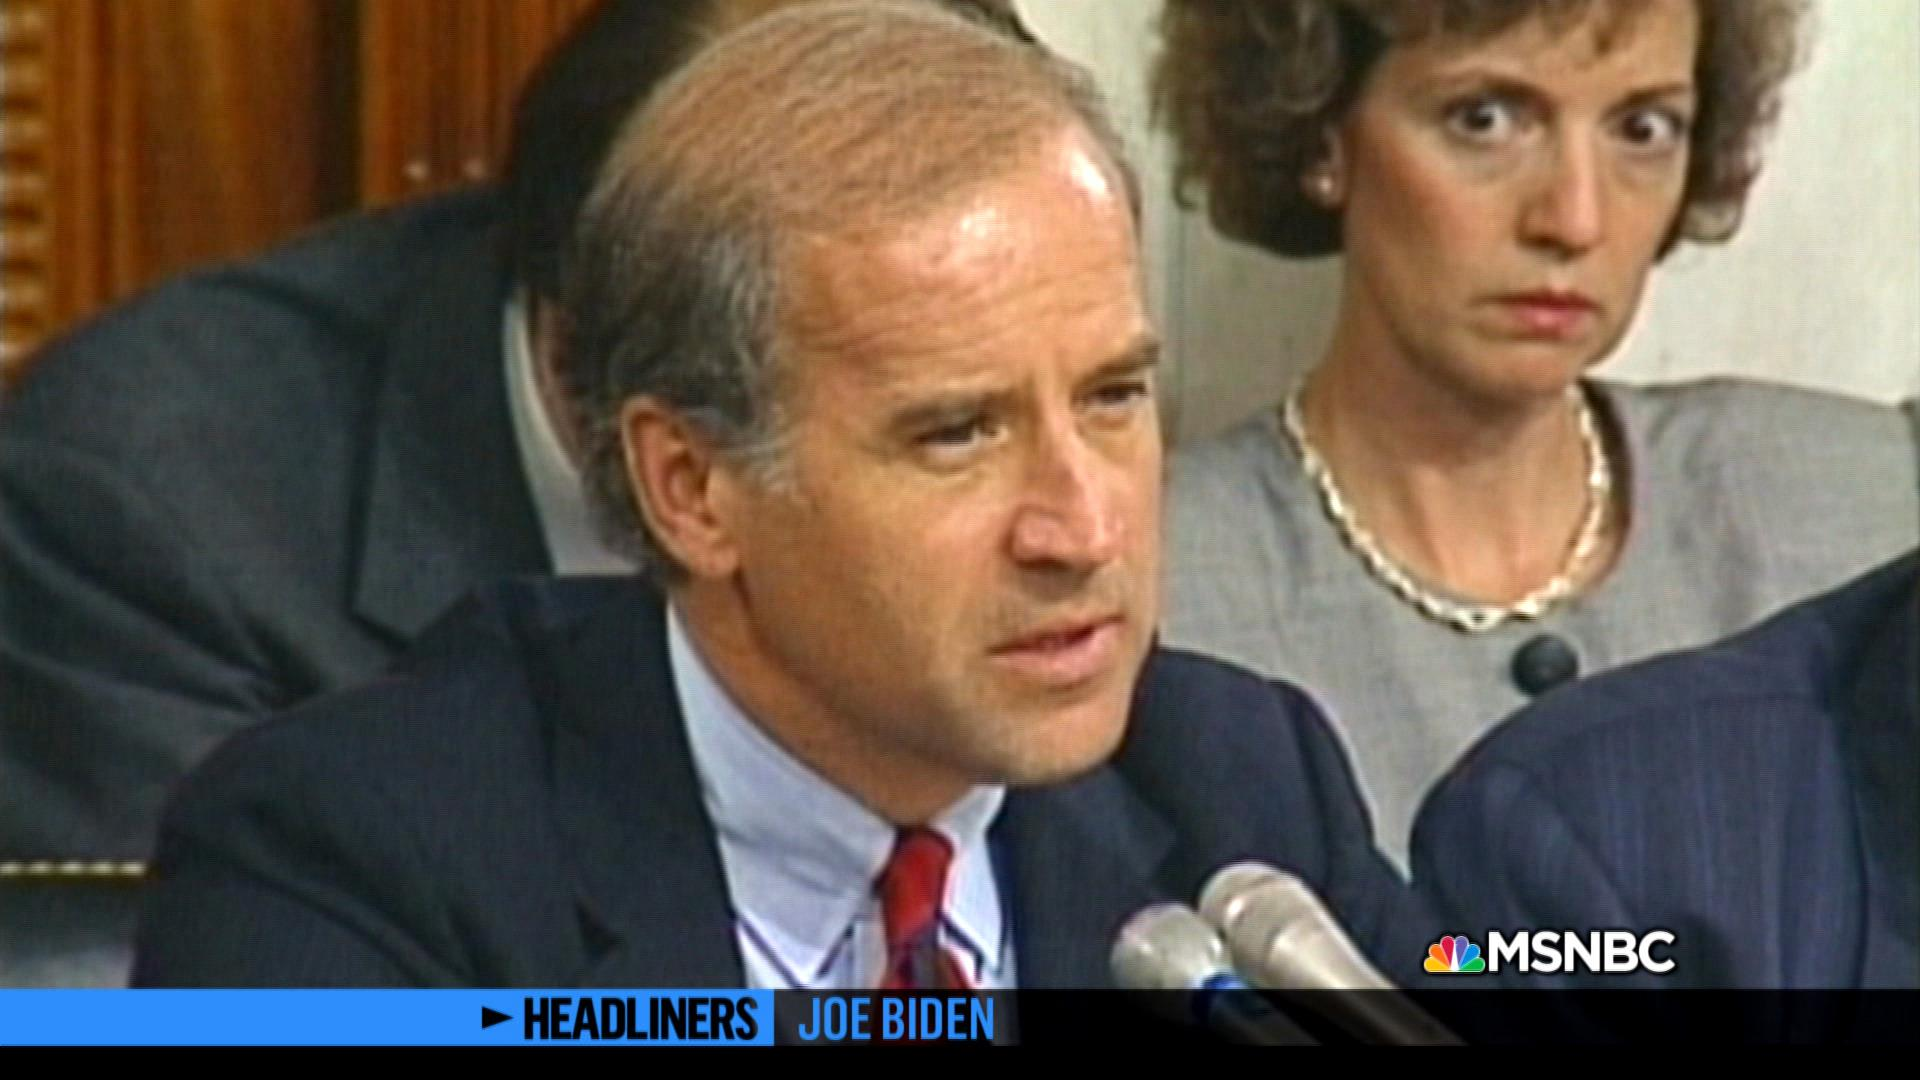 'Headliners: Joe Biden' Anita Hill Testimony